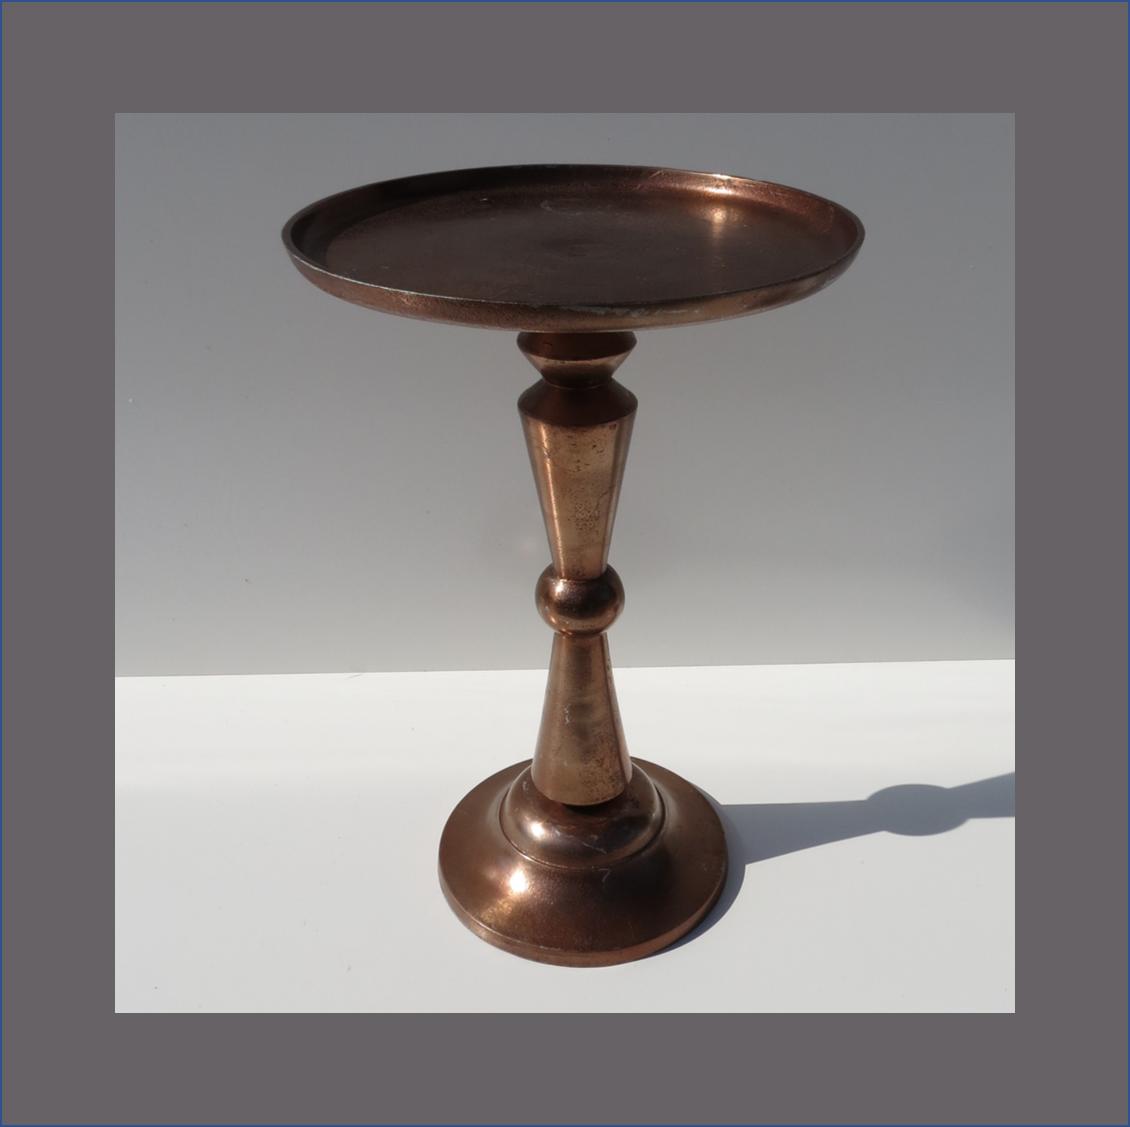 copper-damask-side-table-medium